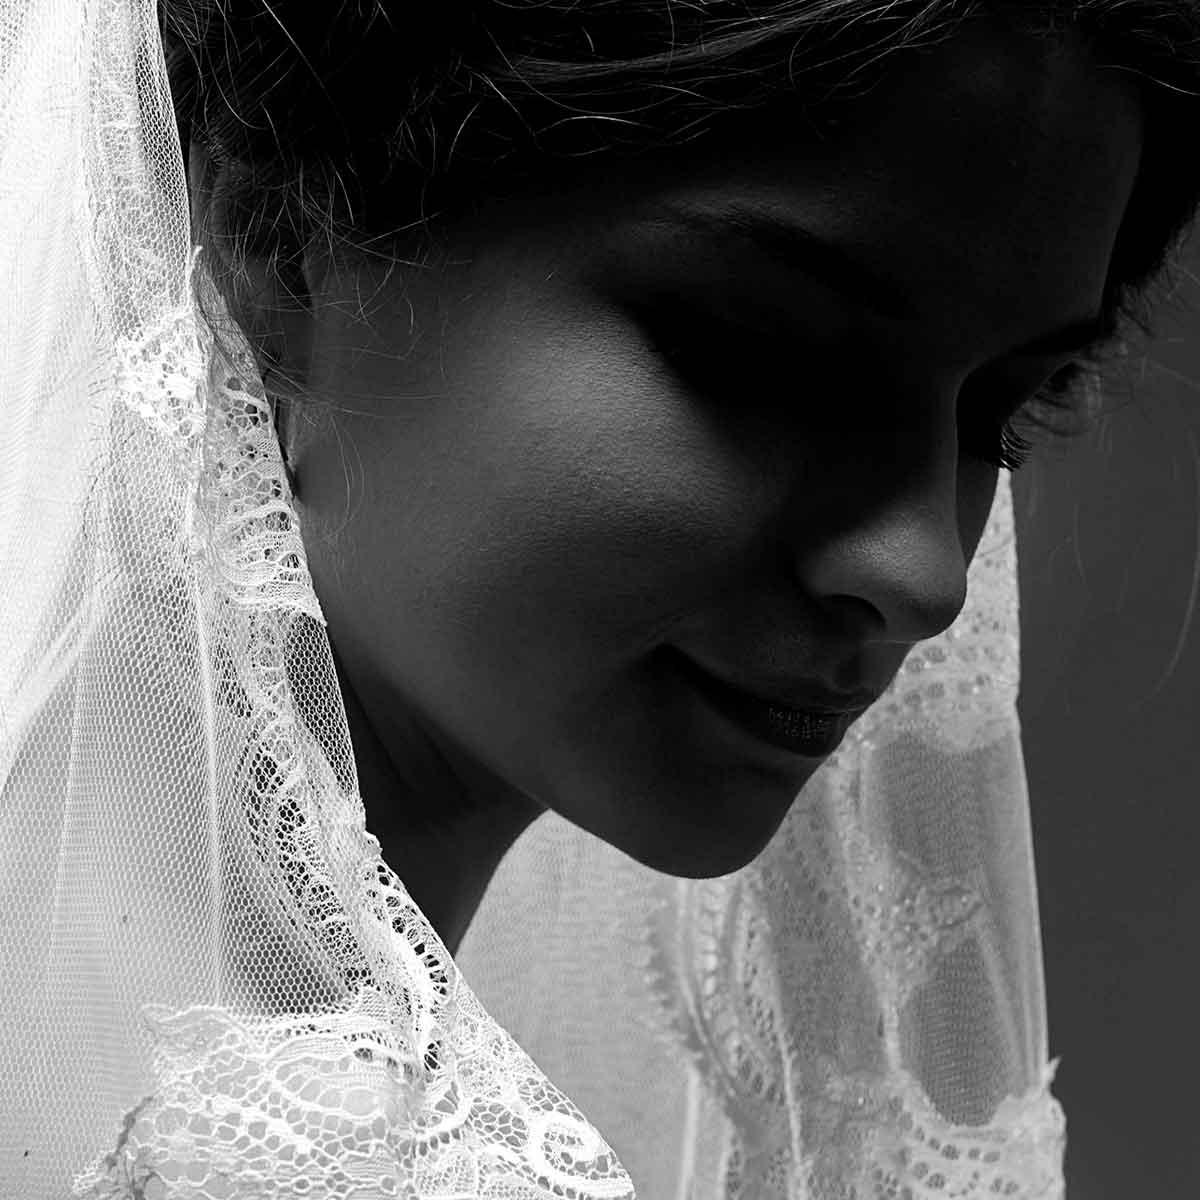 Nowak wedding veil by Gudnitz Copenhagen. Designer Rikke Gudnitz